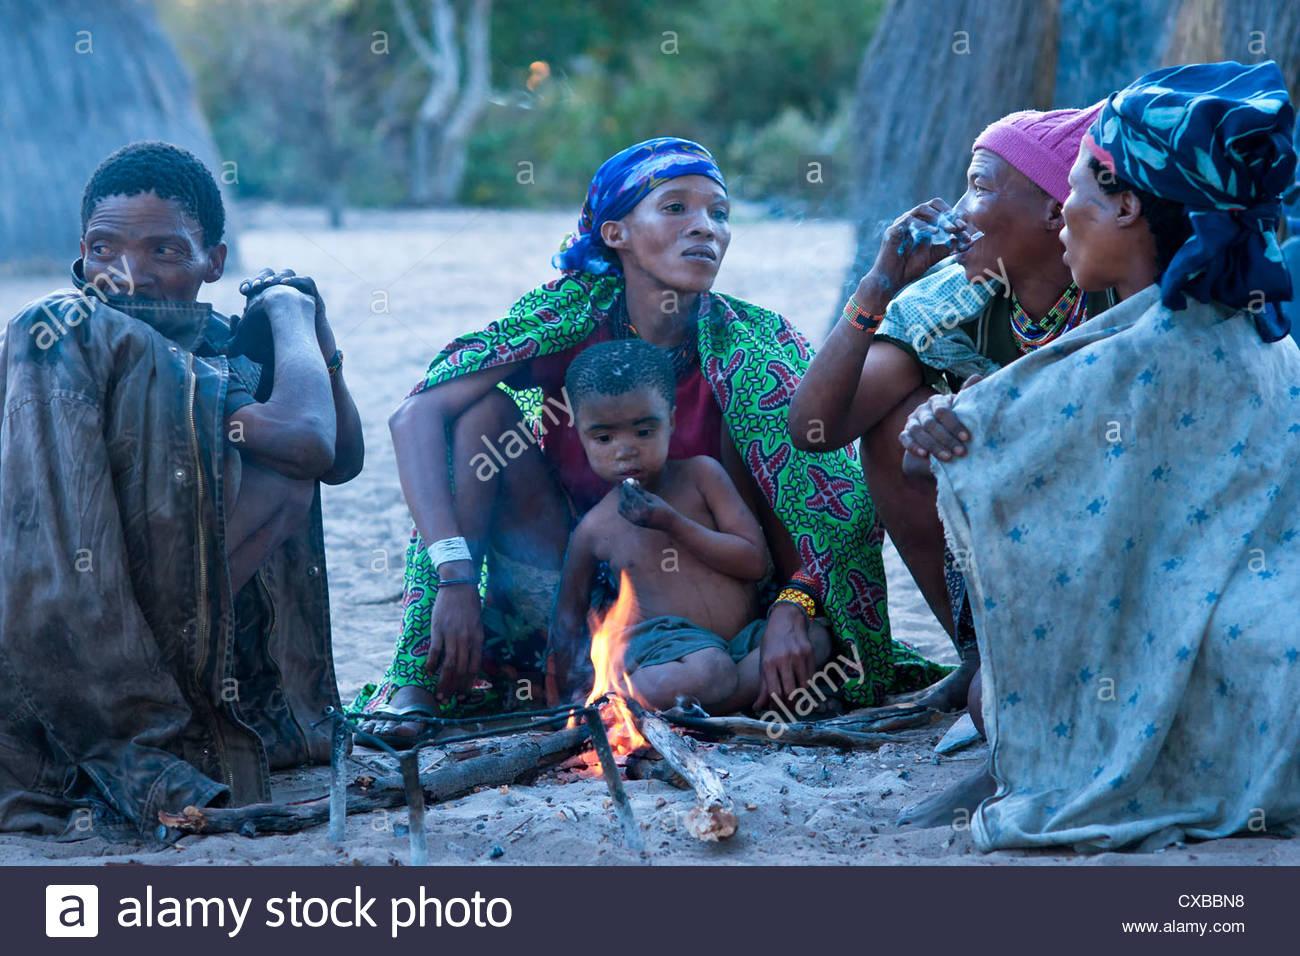 Jul'hoan !Kung Bushmen family around a fire in their village, Bushmanland, Kalahari Desert, Namibia, Africa - Stock Image